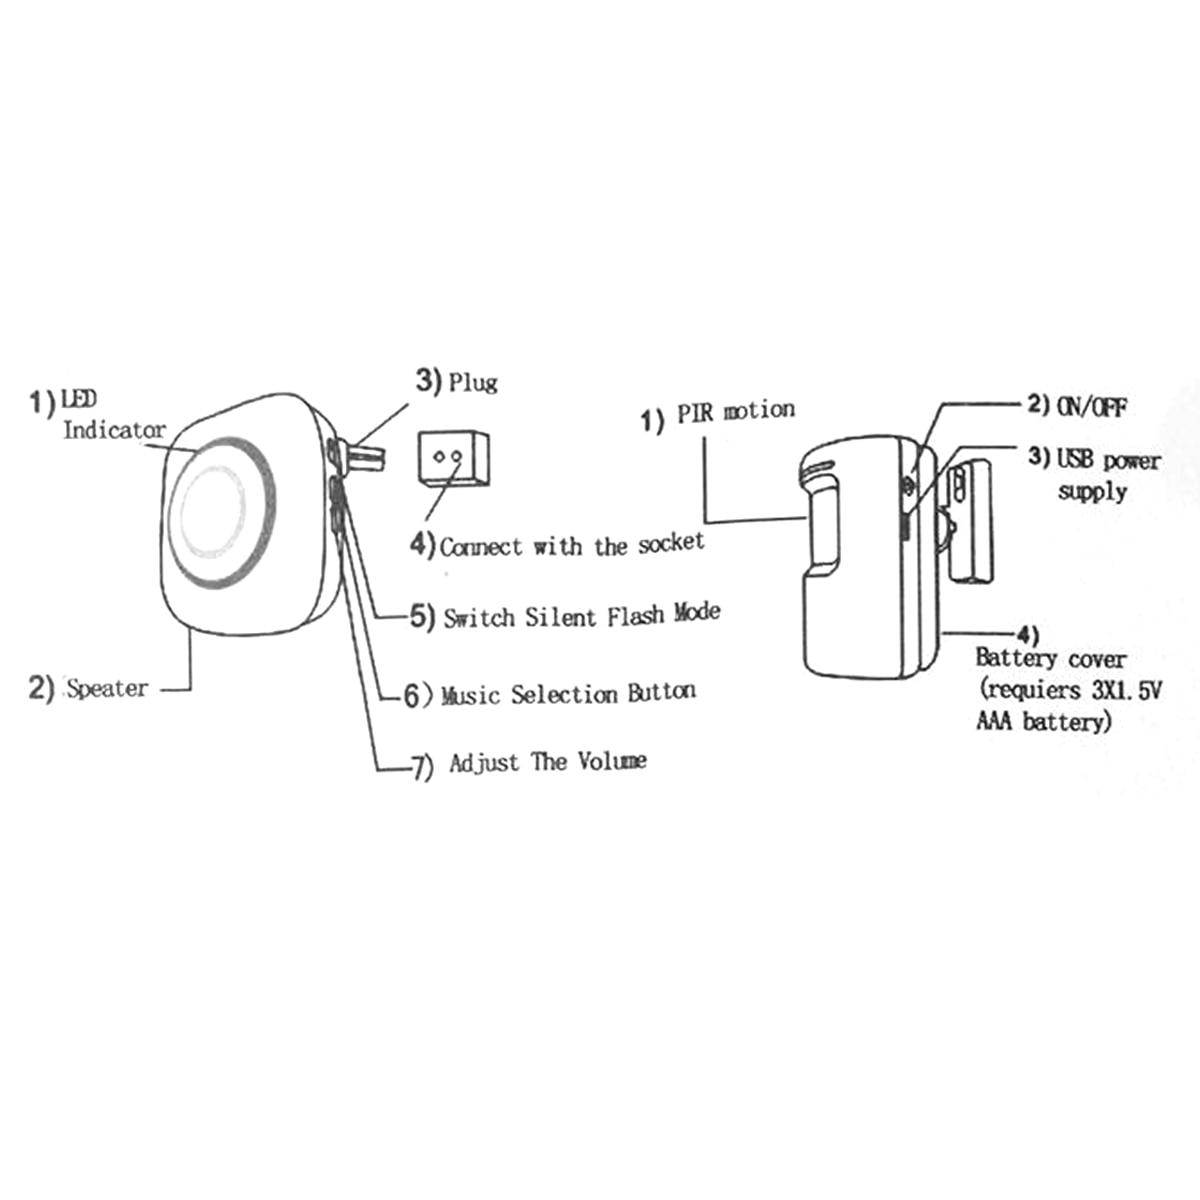 Eu Plug Home Wireless Pir Motion Sensor Doorbell Door Chime Circuit Diagram Infomodule